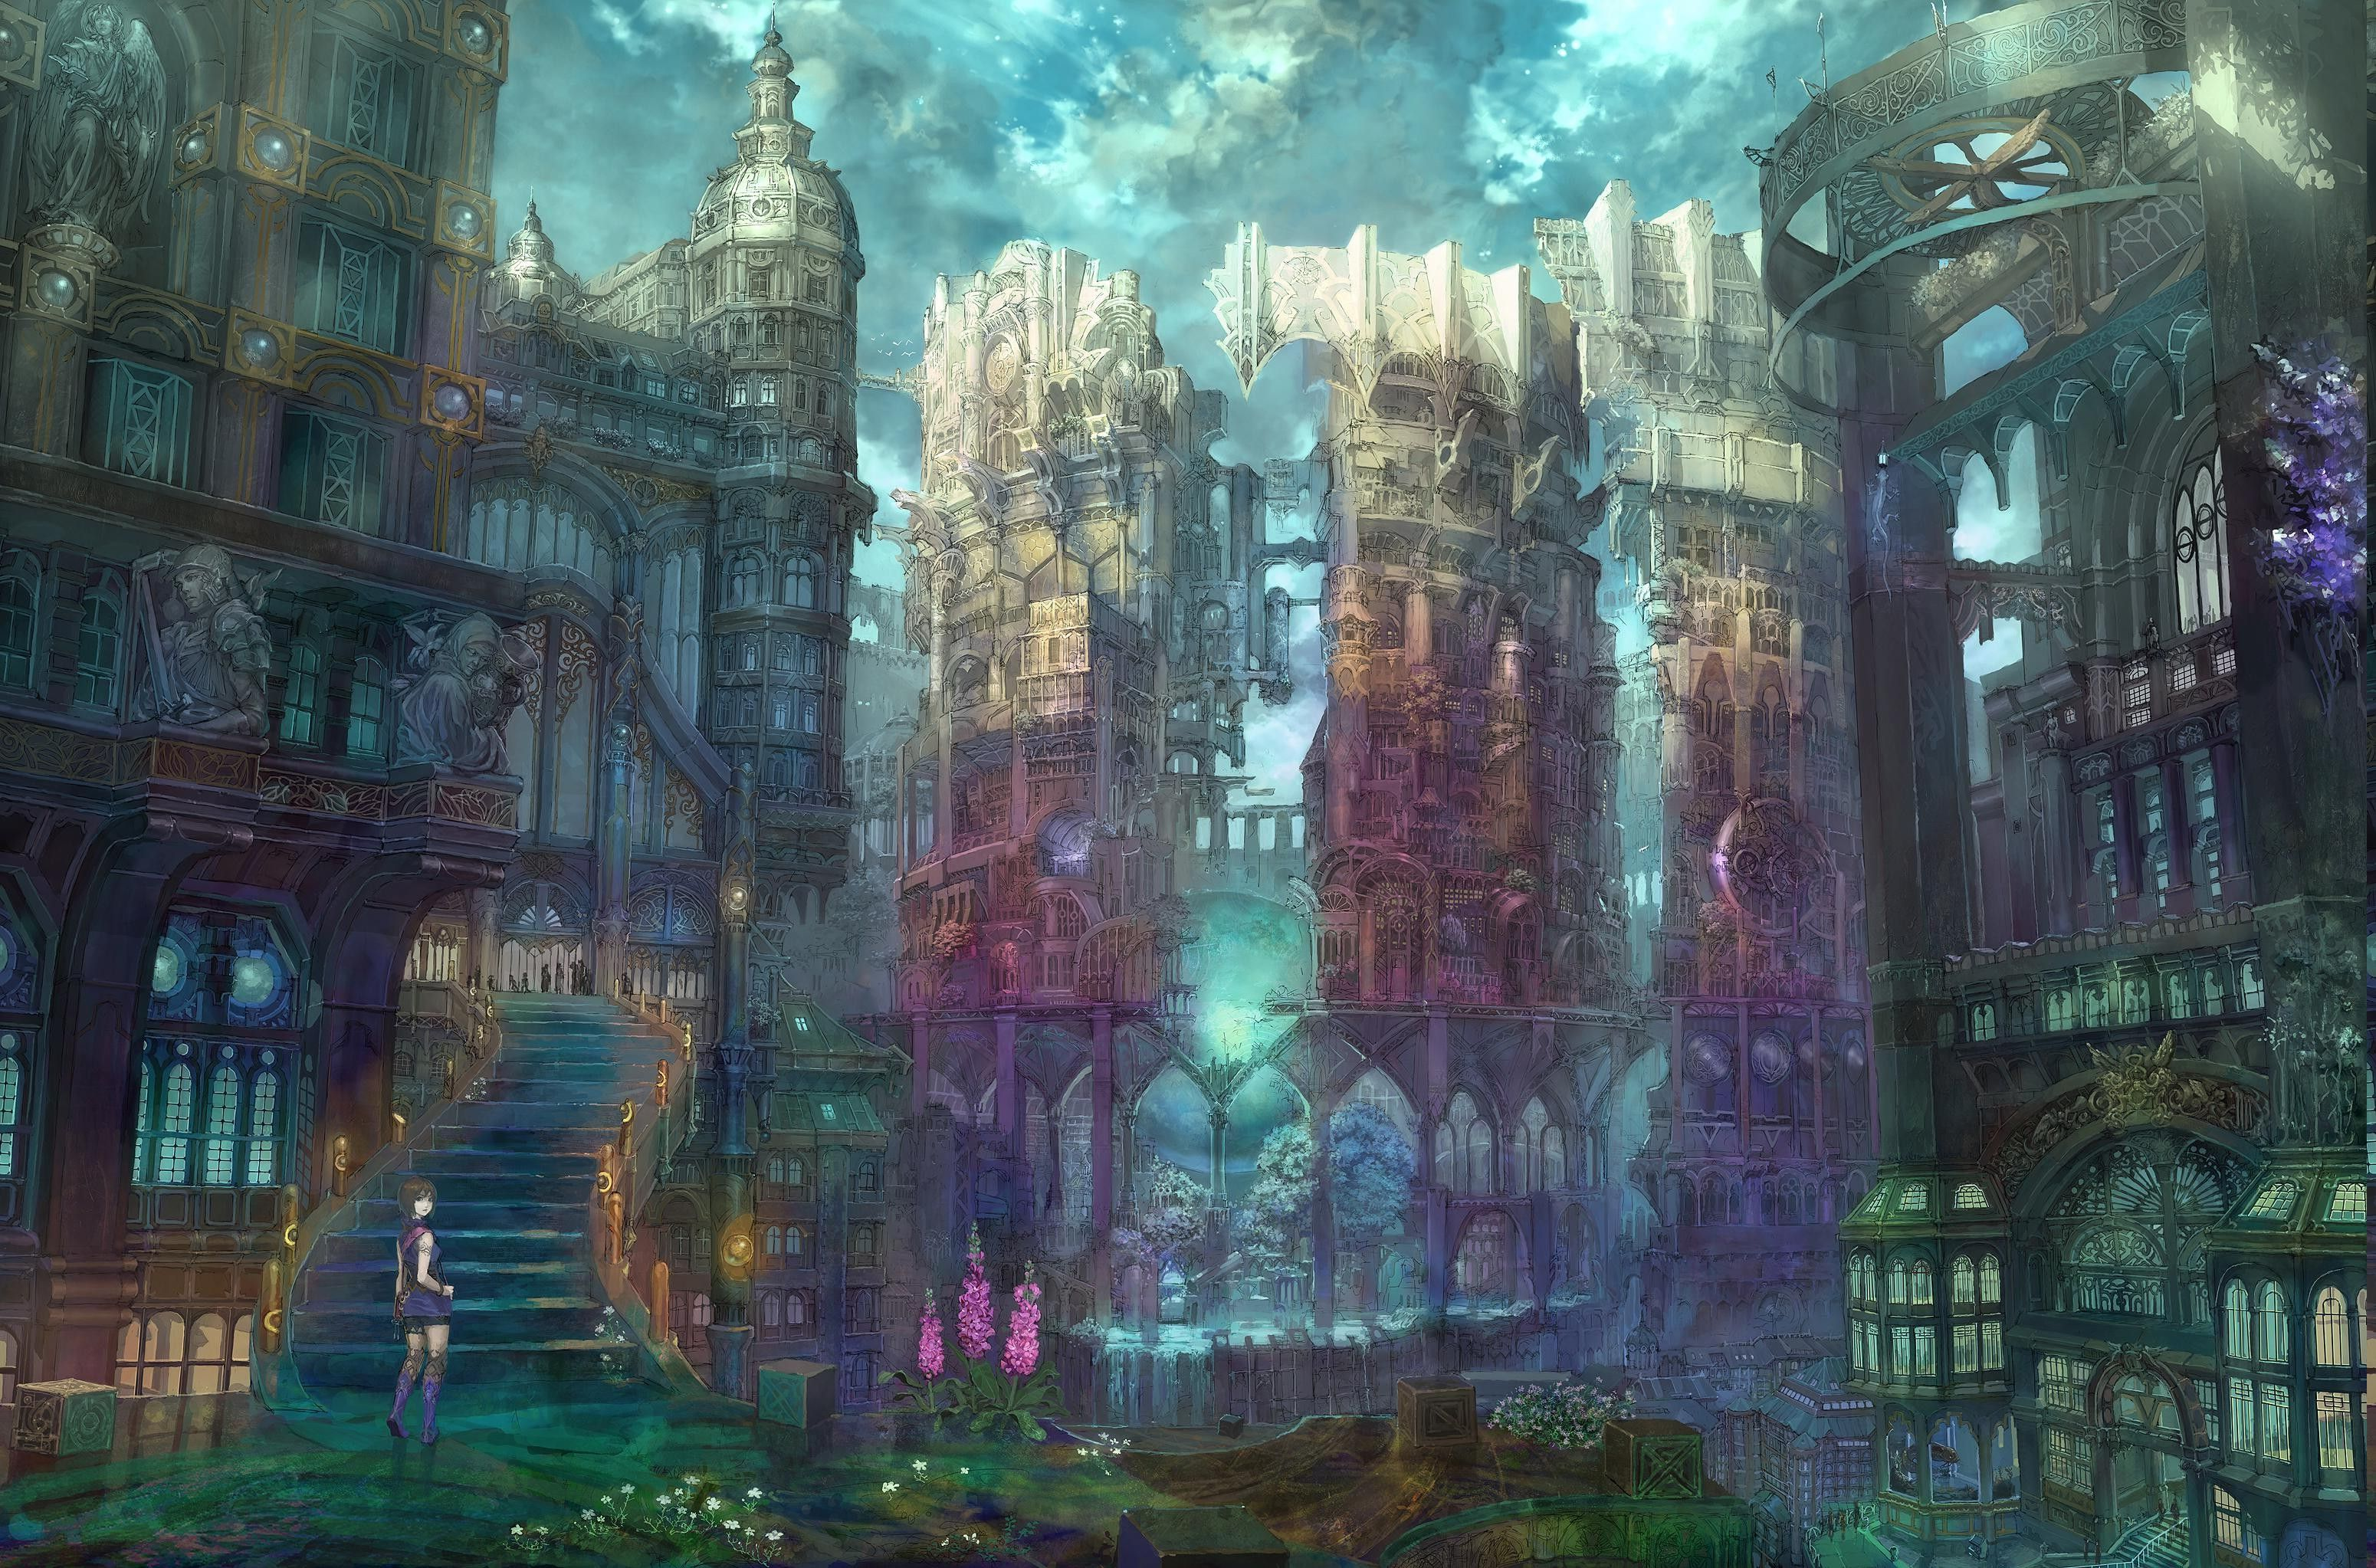 Anime Art Wallpapers - Wallpaper Cave